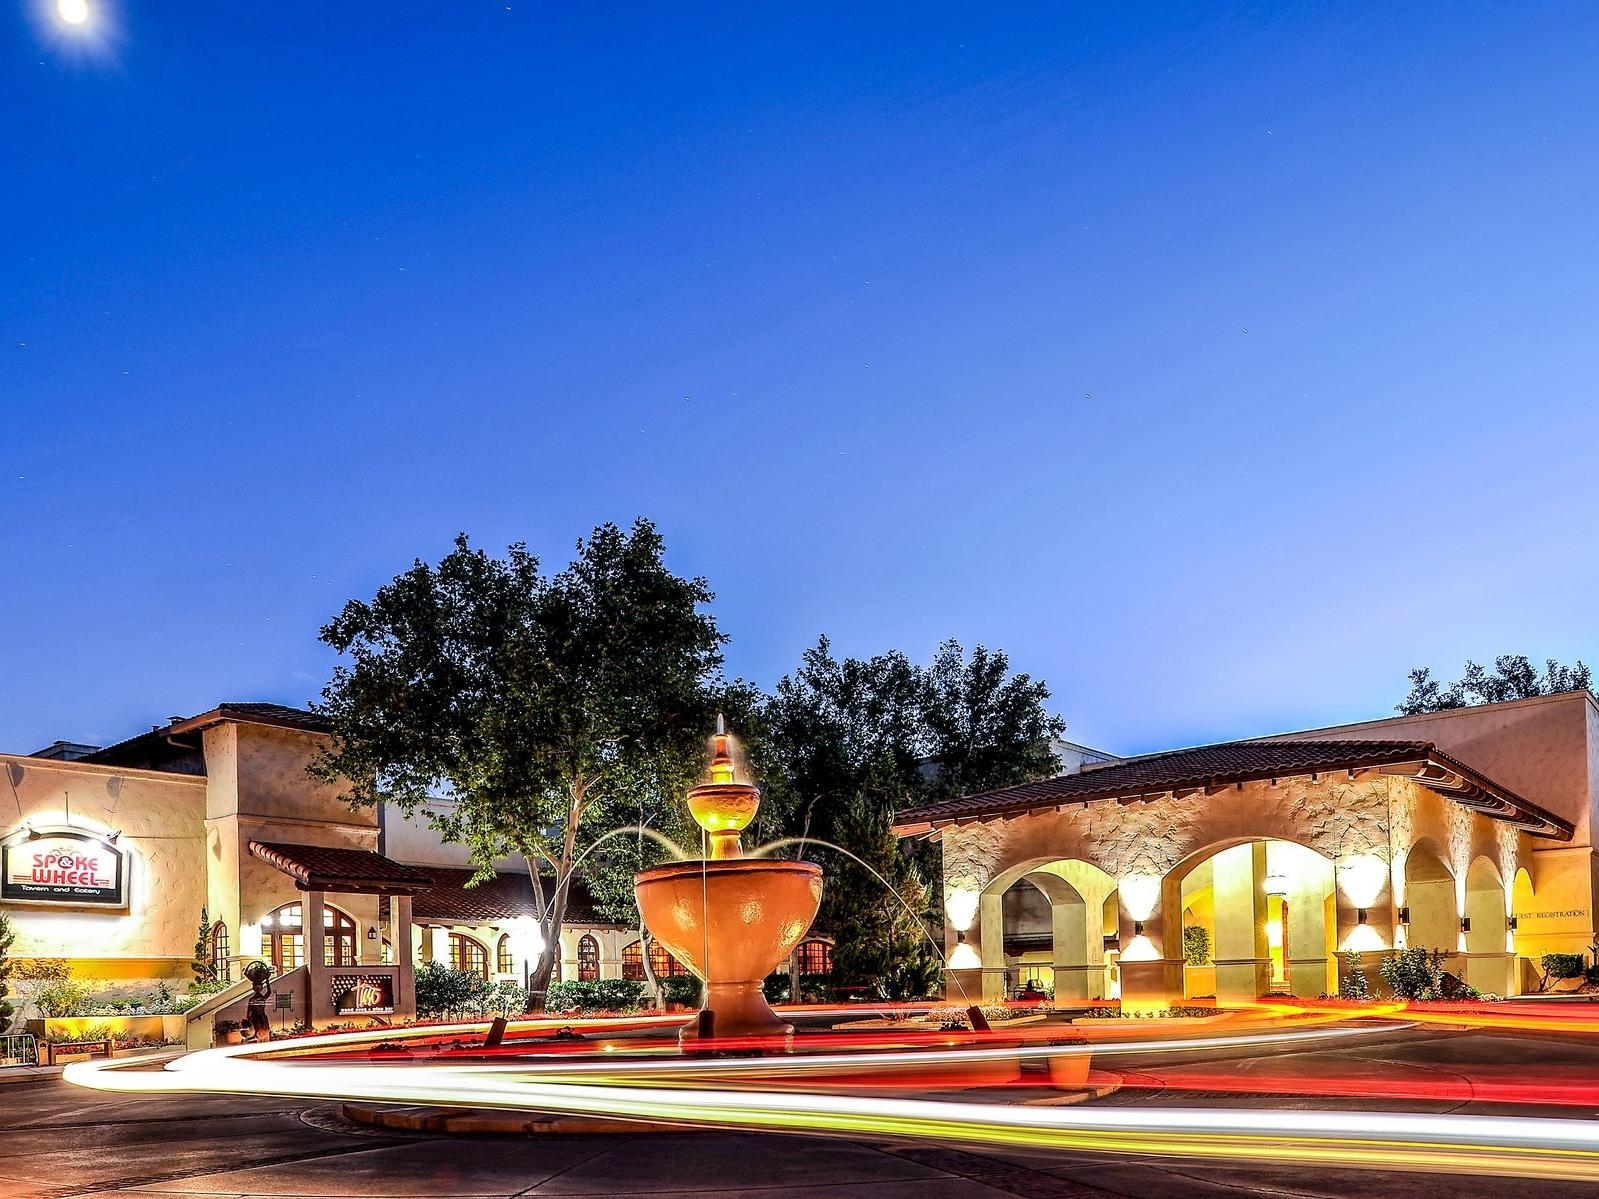 Exterior view of the of Diamond Sedona Portal Hotel's restaurants